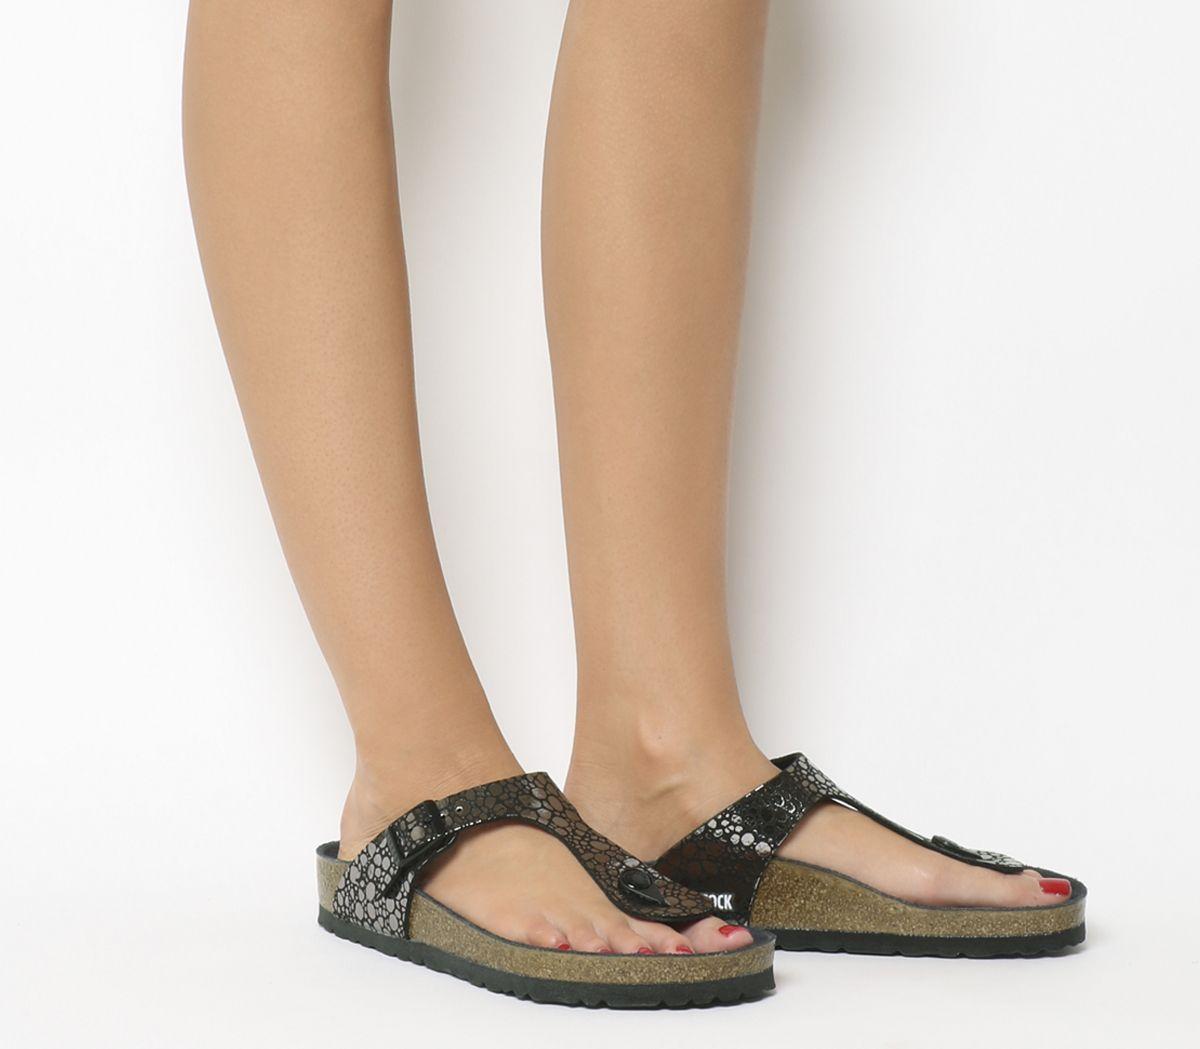 Details about Womens Birkenstock Gizeh Toe Thong Sandals Metallic Stones Black Exclusive Sanda